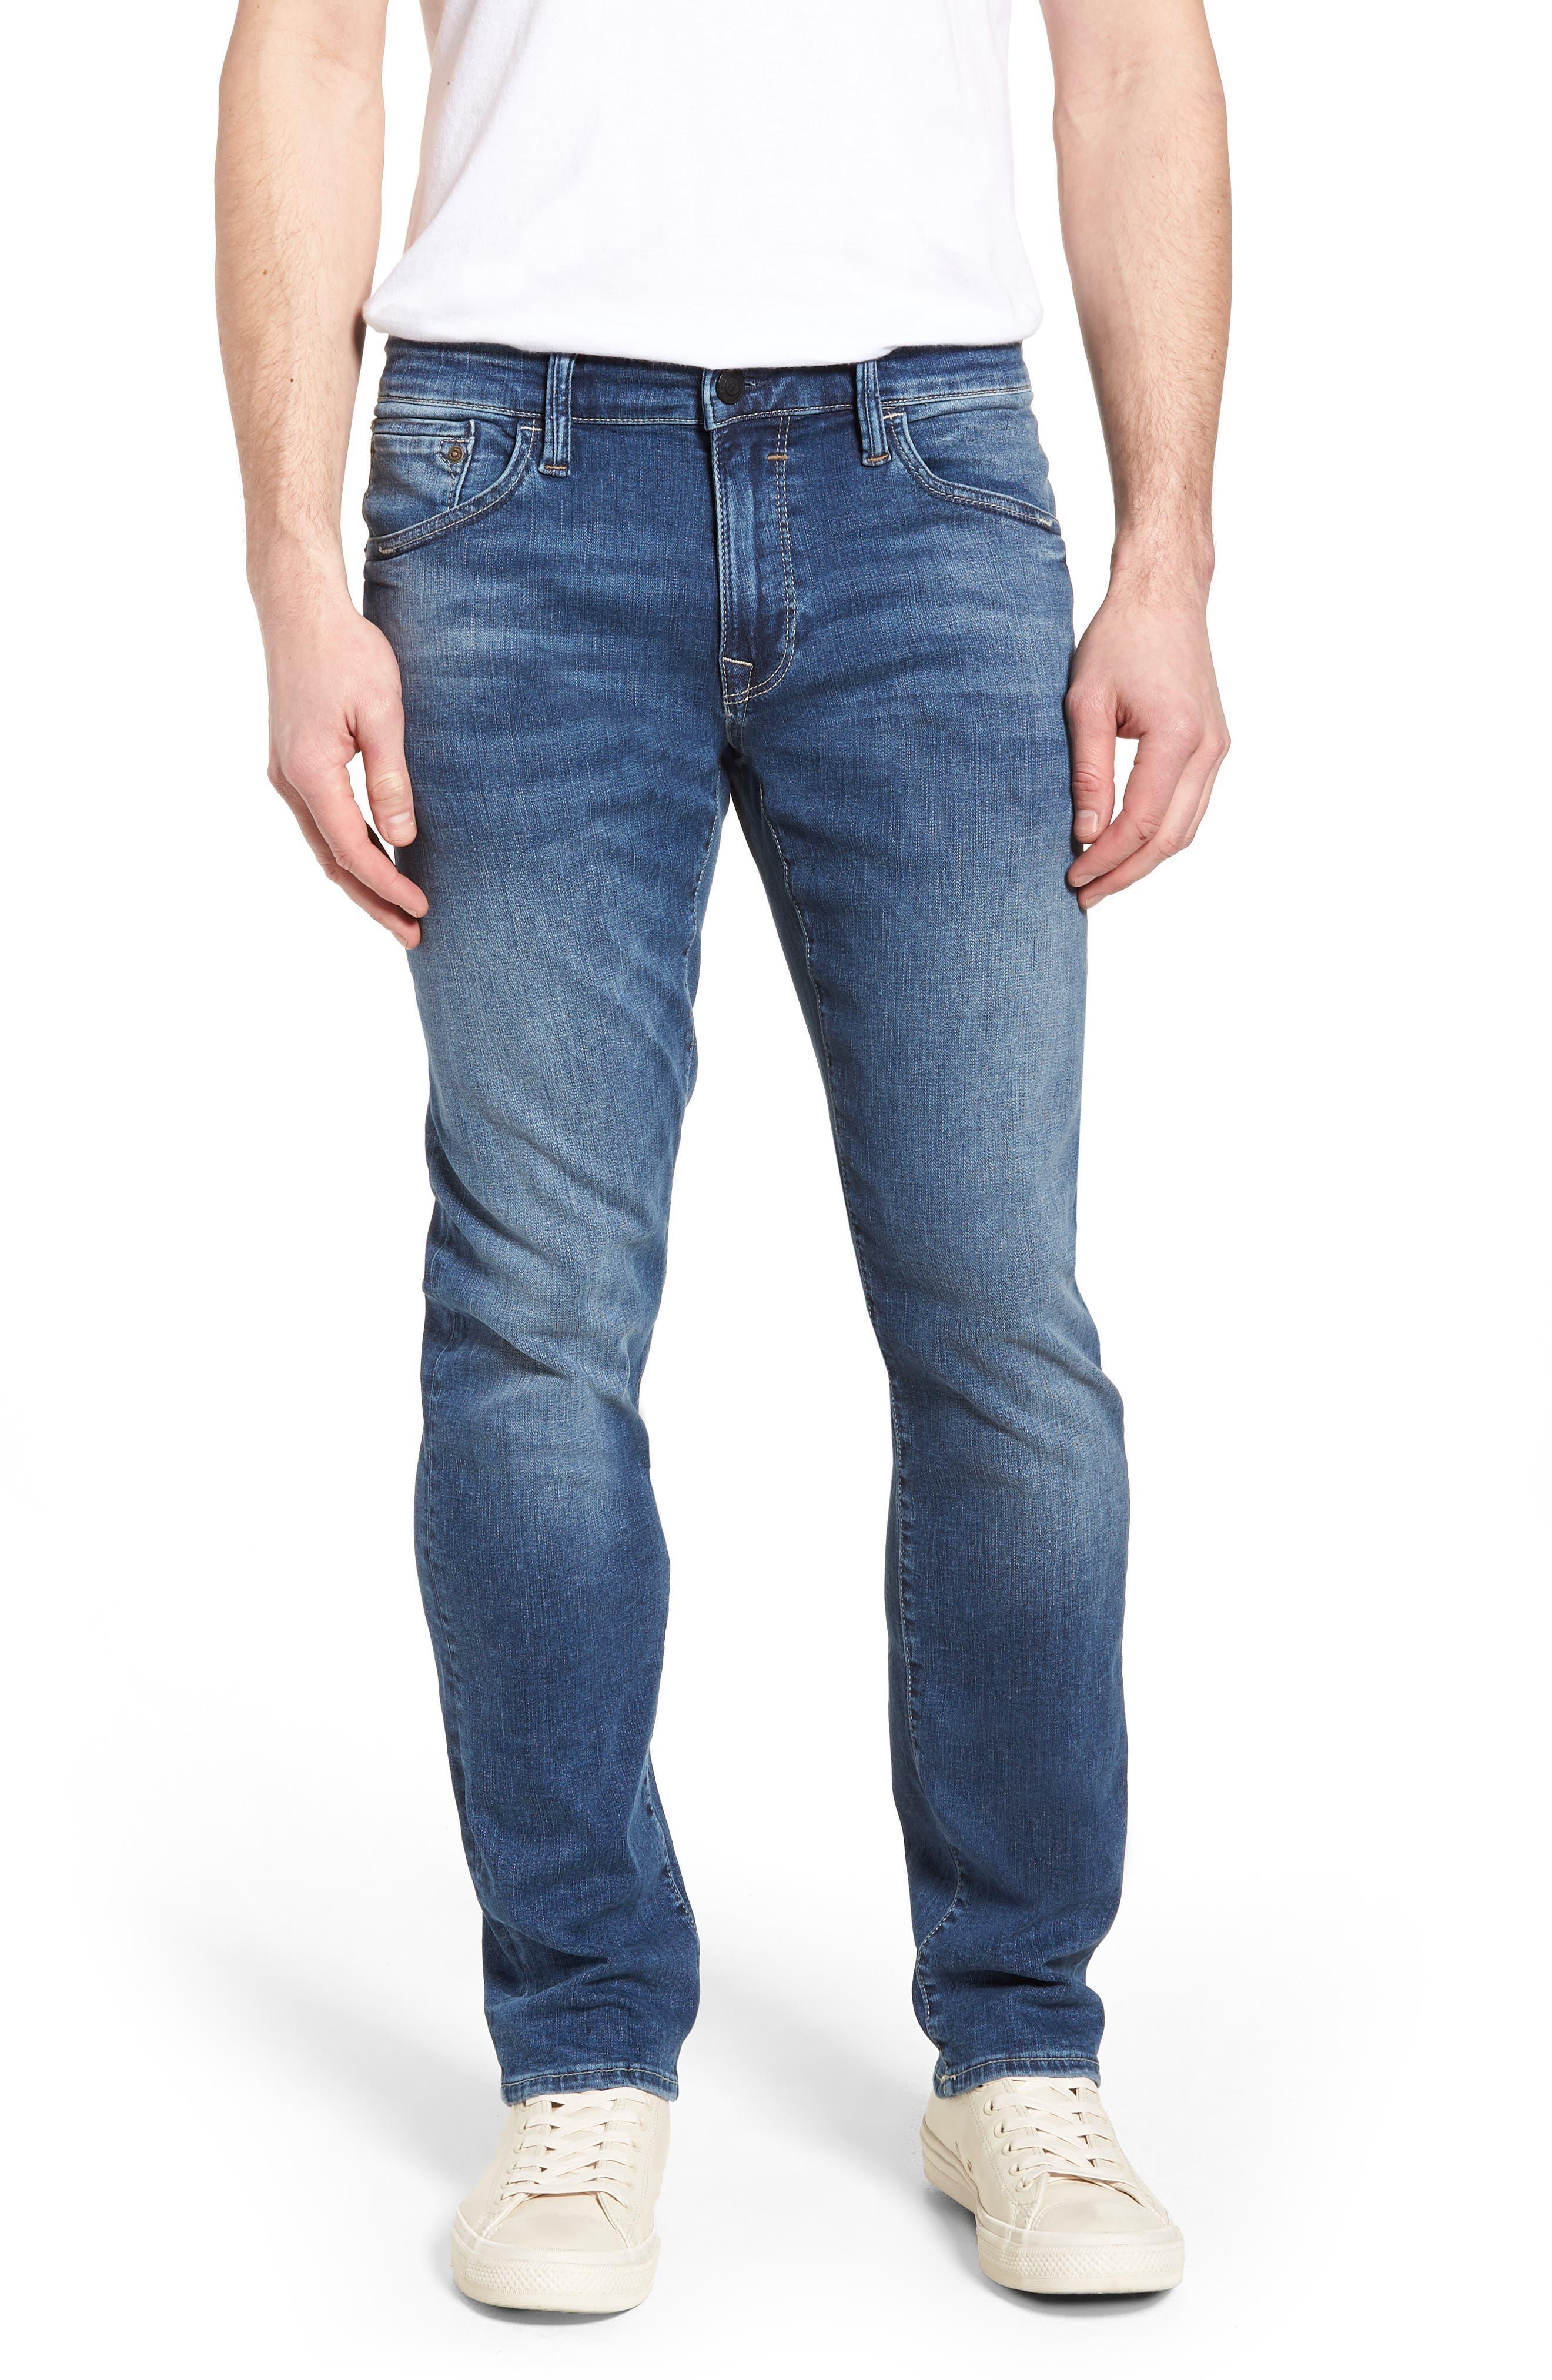 Zach Straight Leg Jeans,                             Main thumbnail 1, color,                             Indigo Cashmere